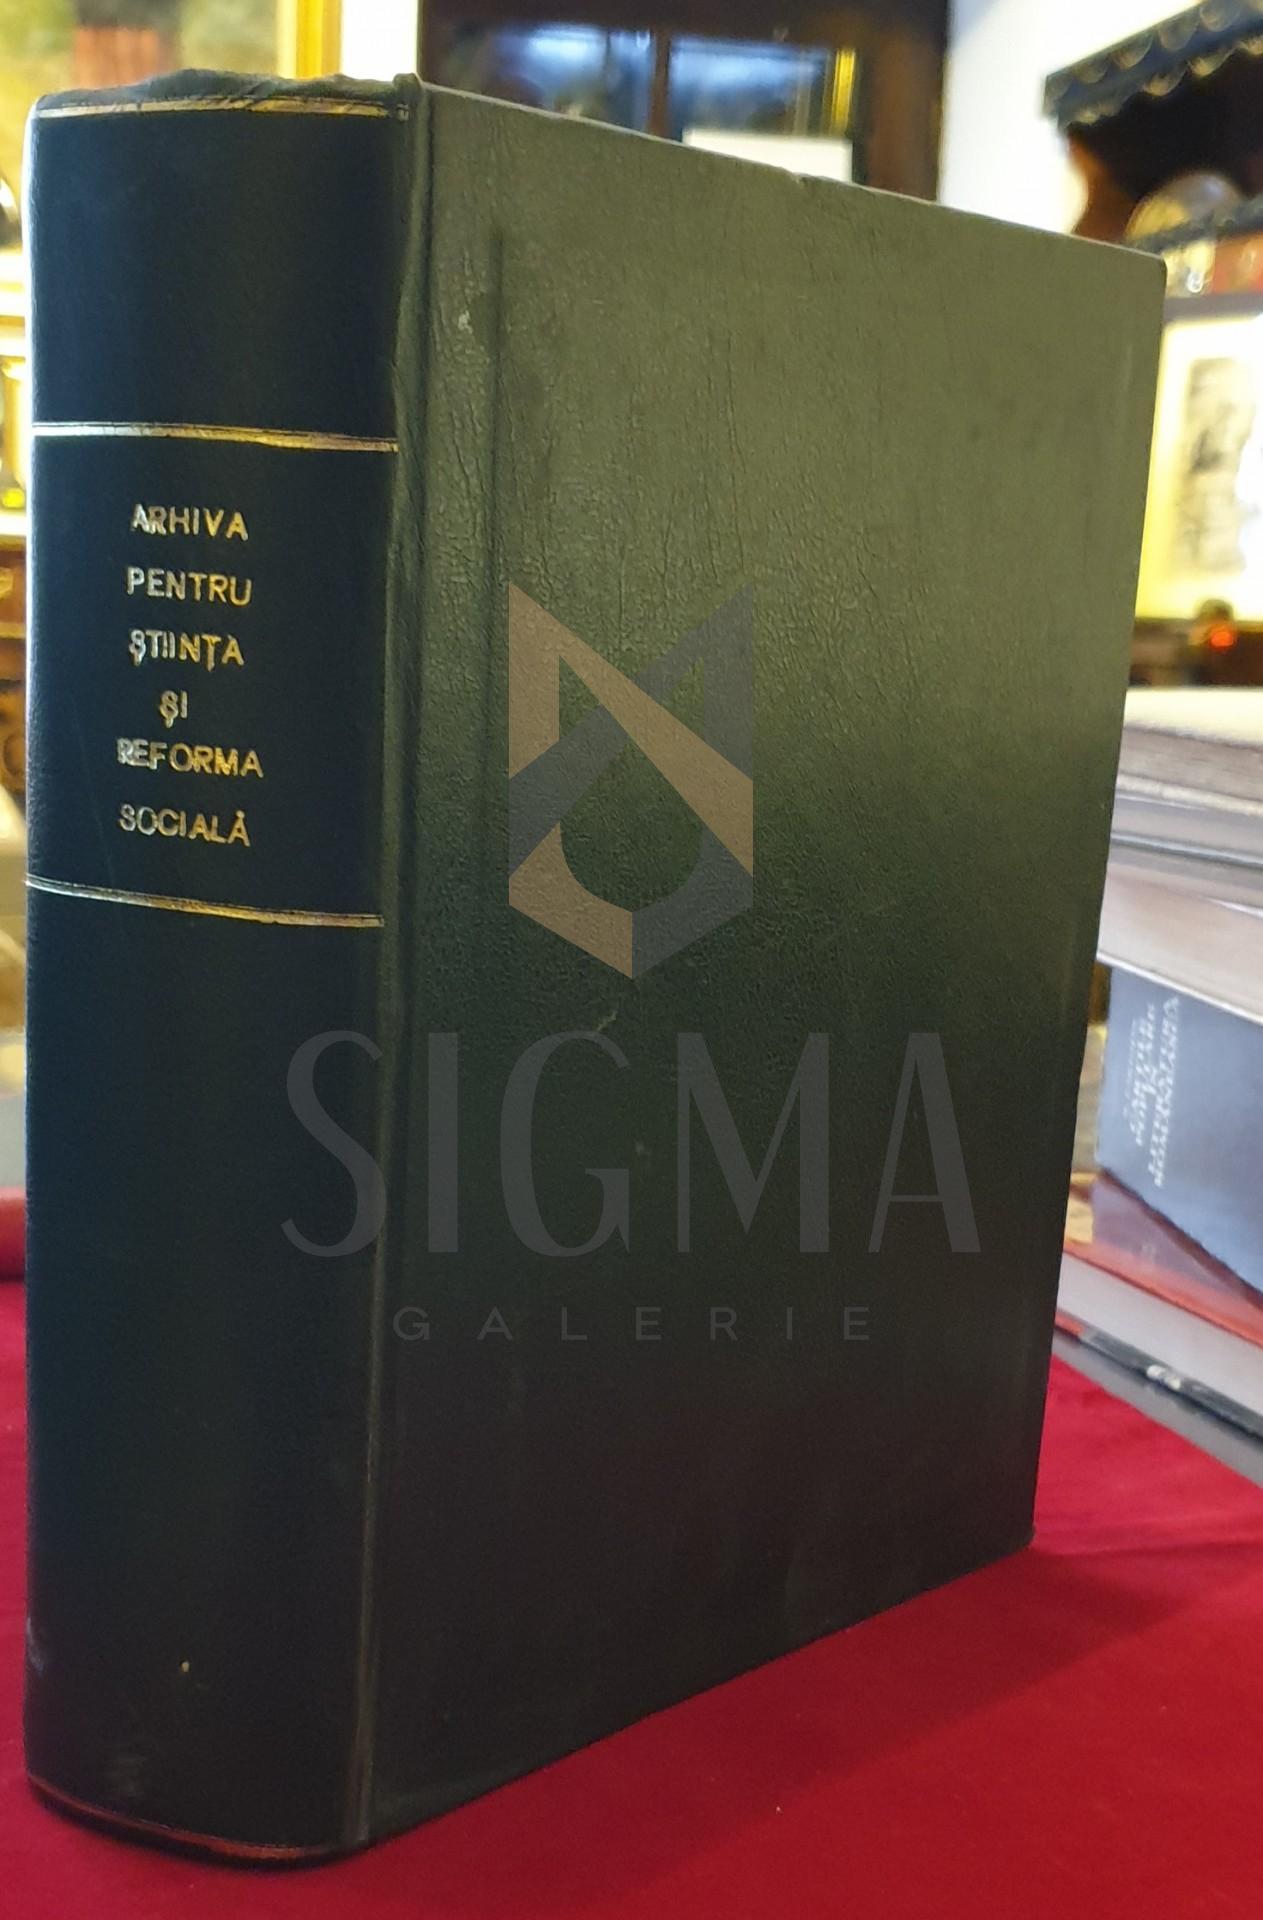 Arhiva pentru stiinta si reforma sociala, an ix, 1930